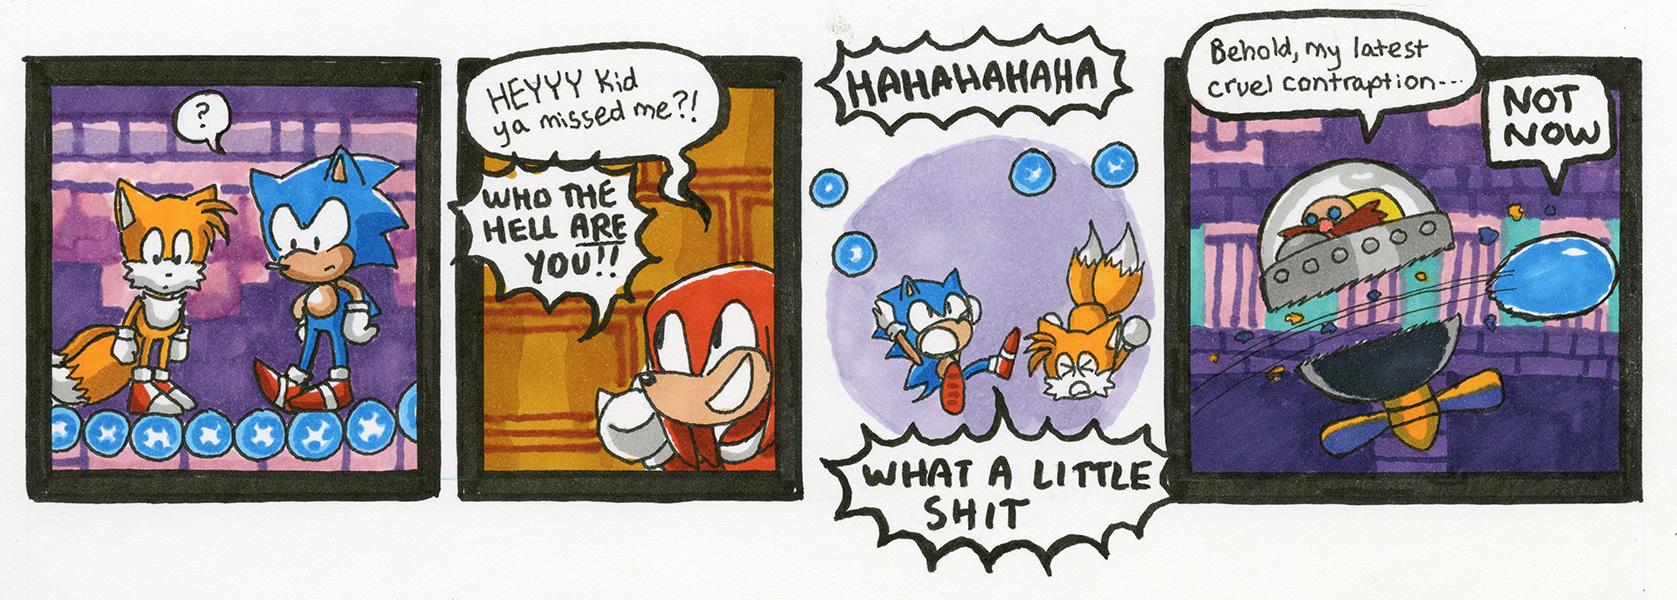 Sonic the Hedgehog 3: Hydrocity Zone Boss